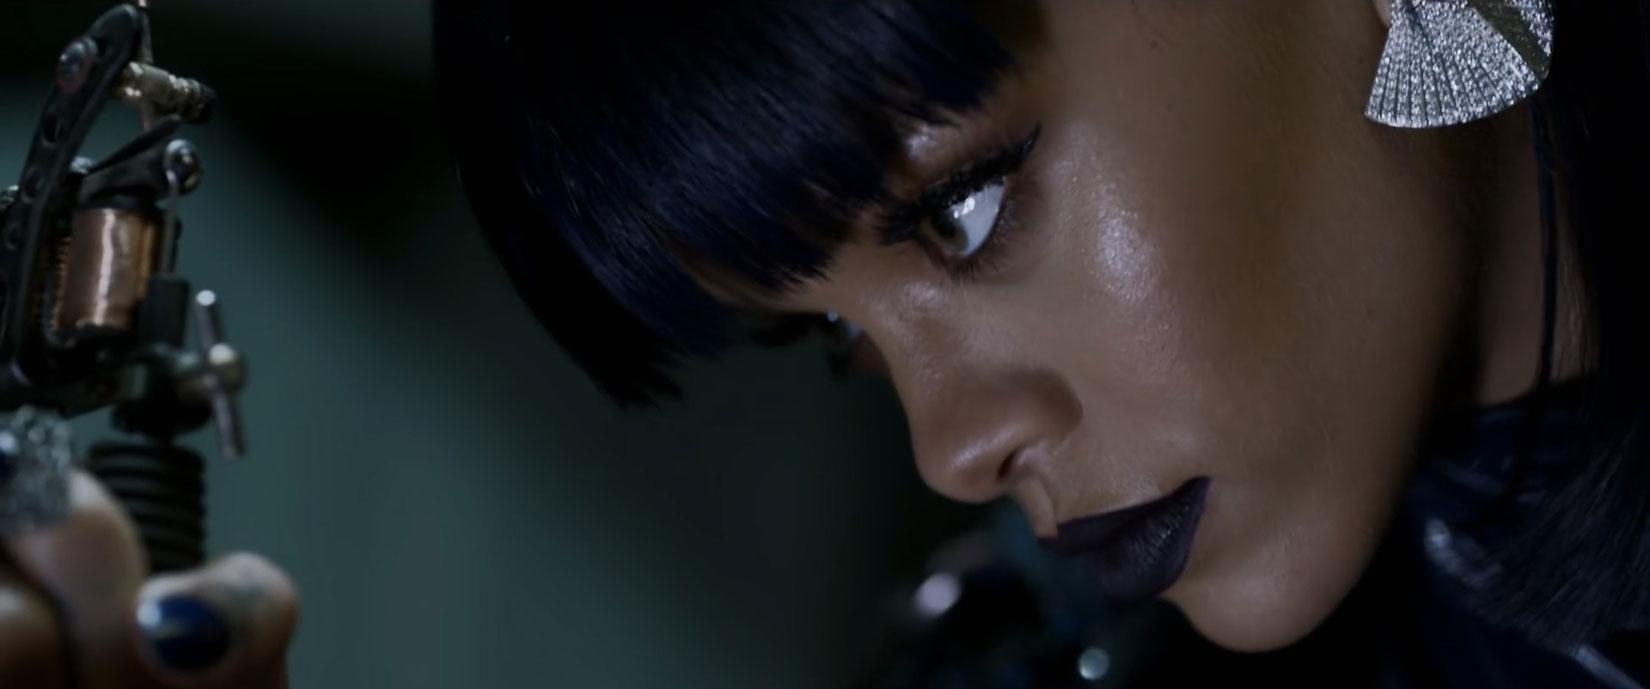 Rihanna_ANTI_diaRy_8